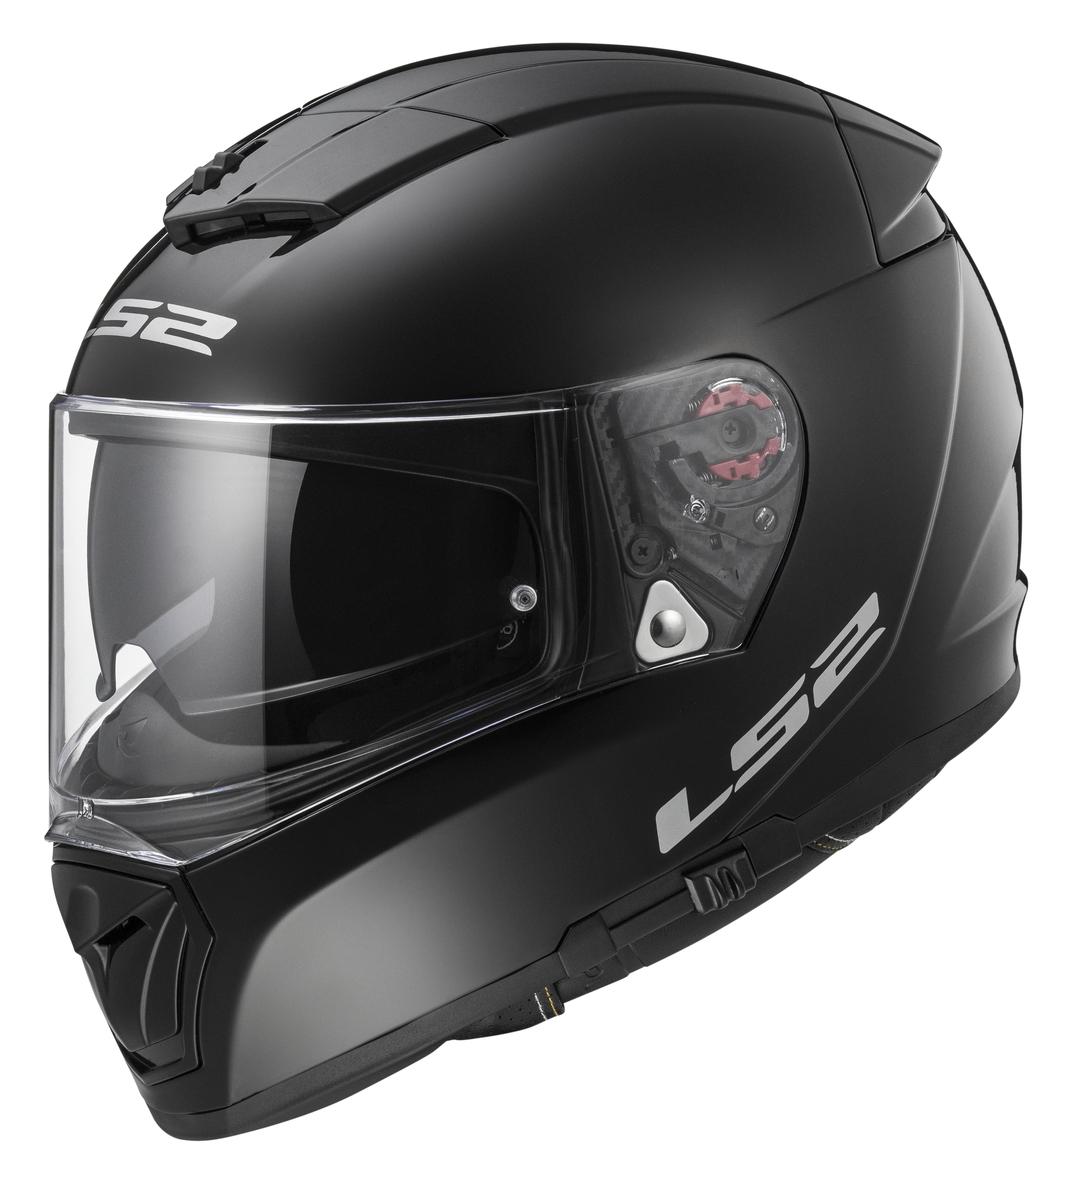 Dirt Bike Helmet With Visor >> LS2 Breaker Helmet - RevZilla